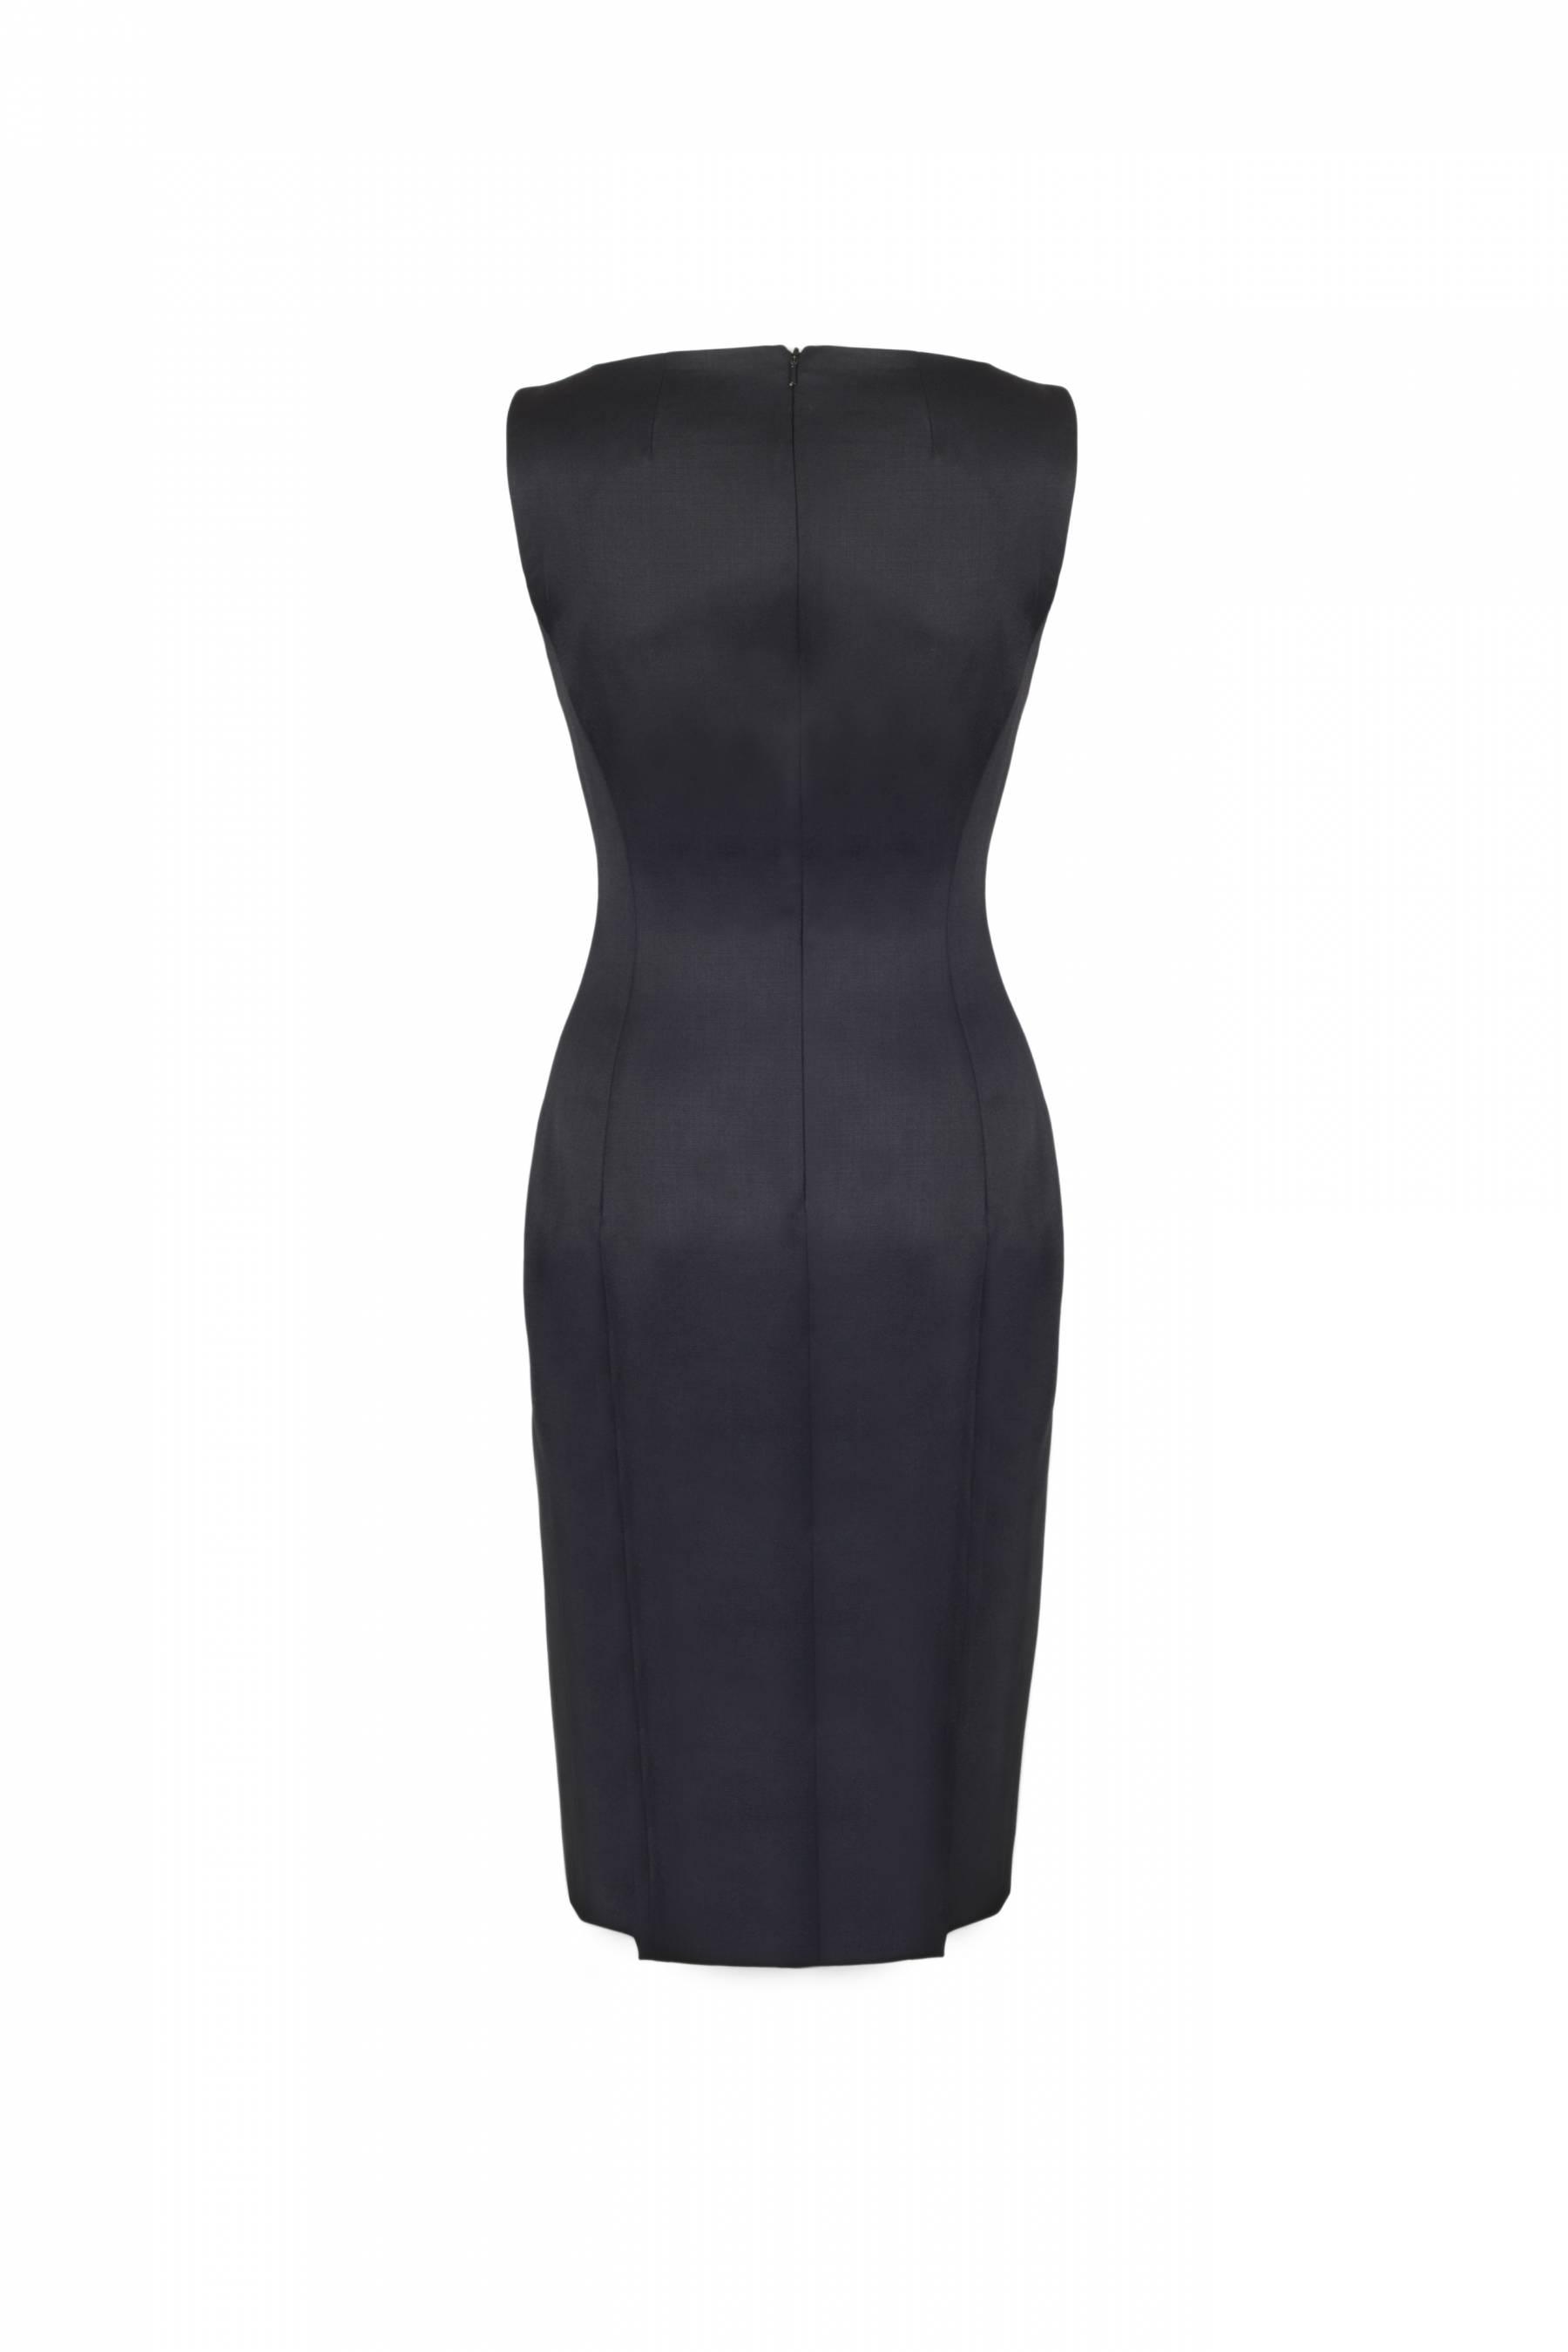 Pin-tuck-dress1